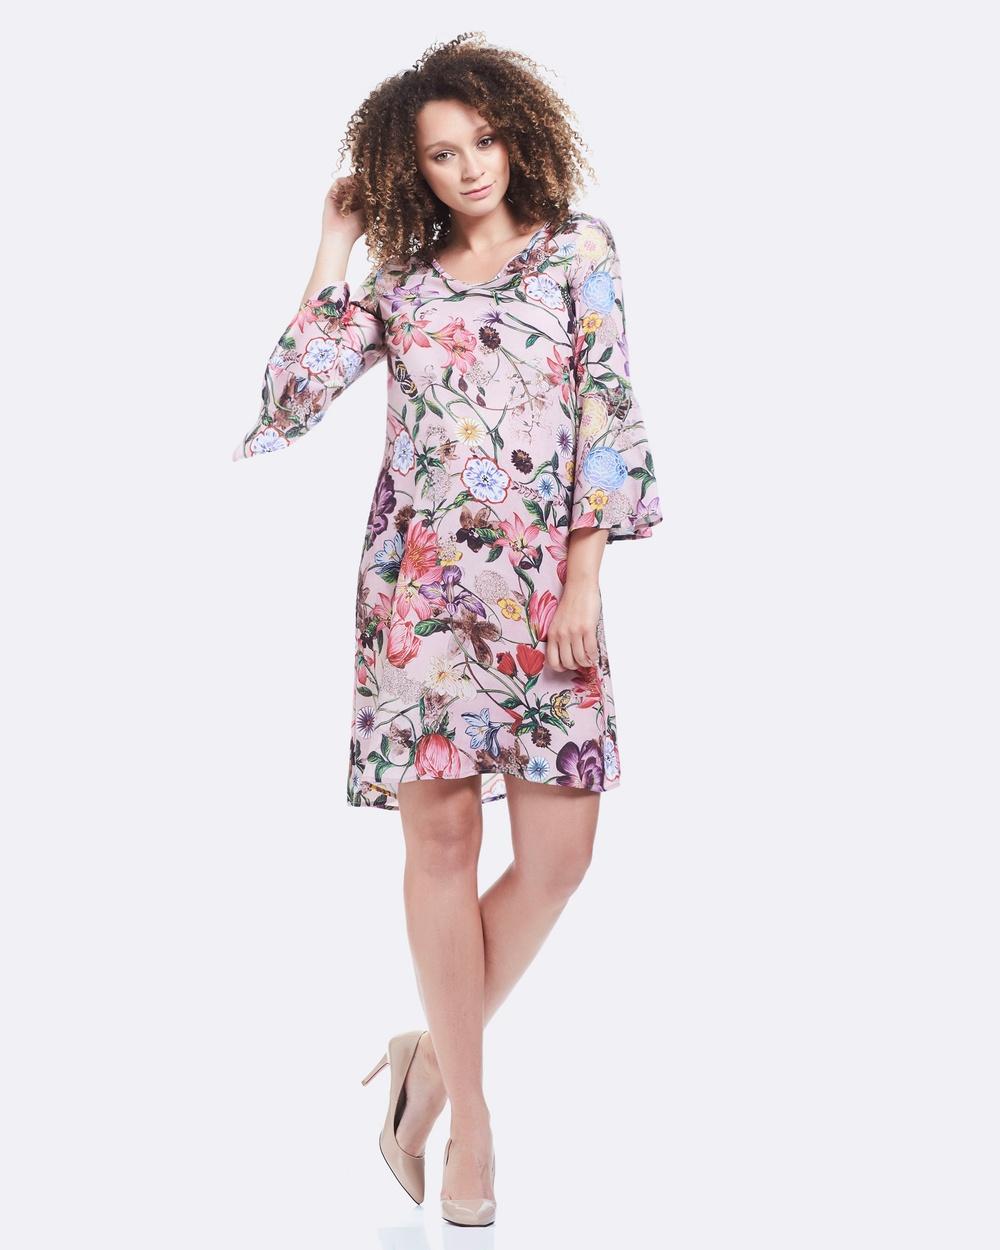 Soon Maternity Harper Bell Sleeve Dress Dresses Pink Harper Bell Sleeve Dress